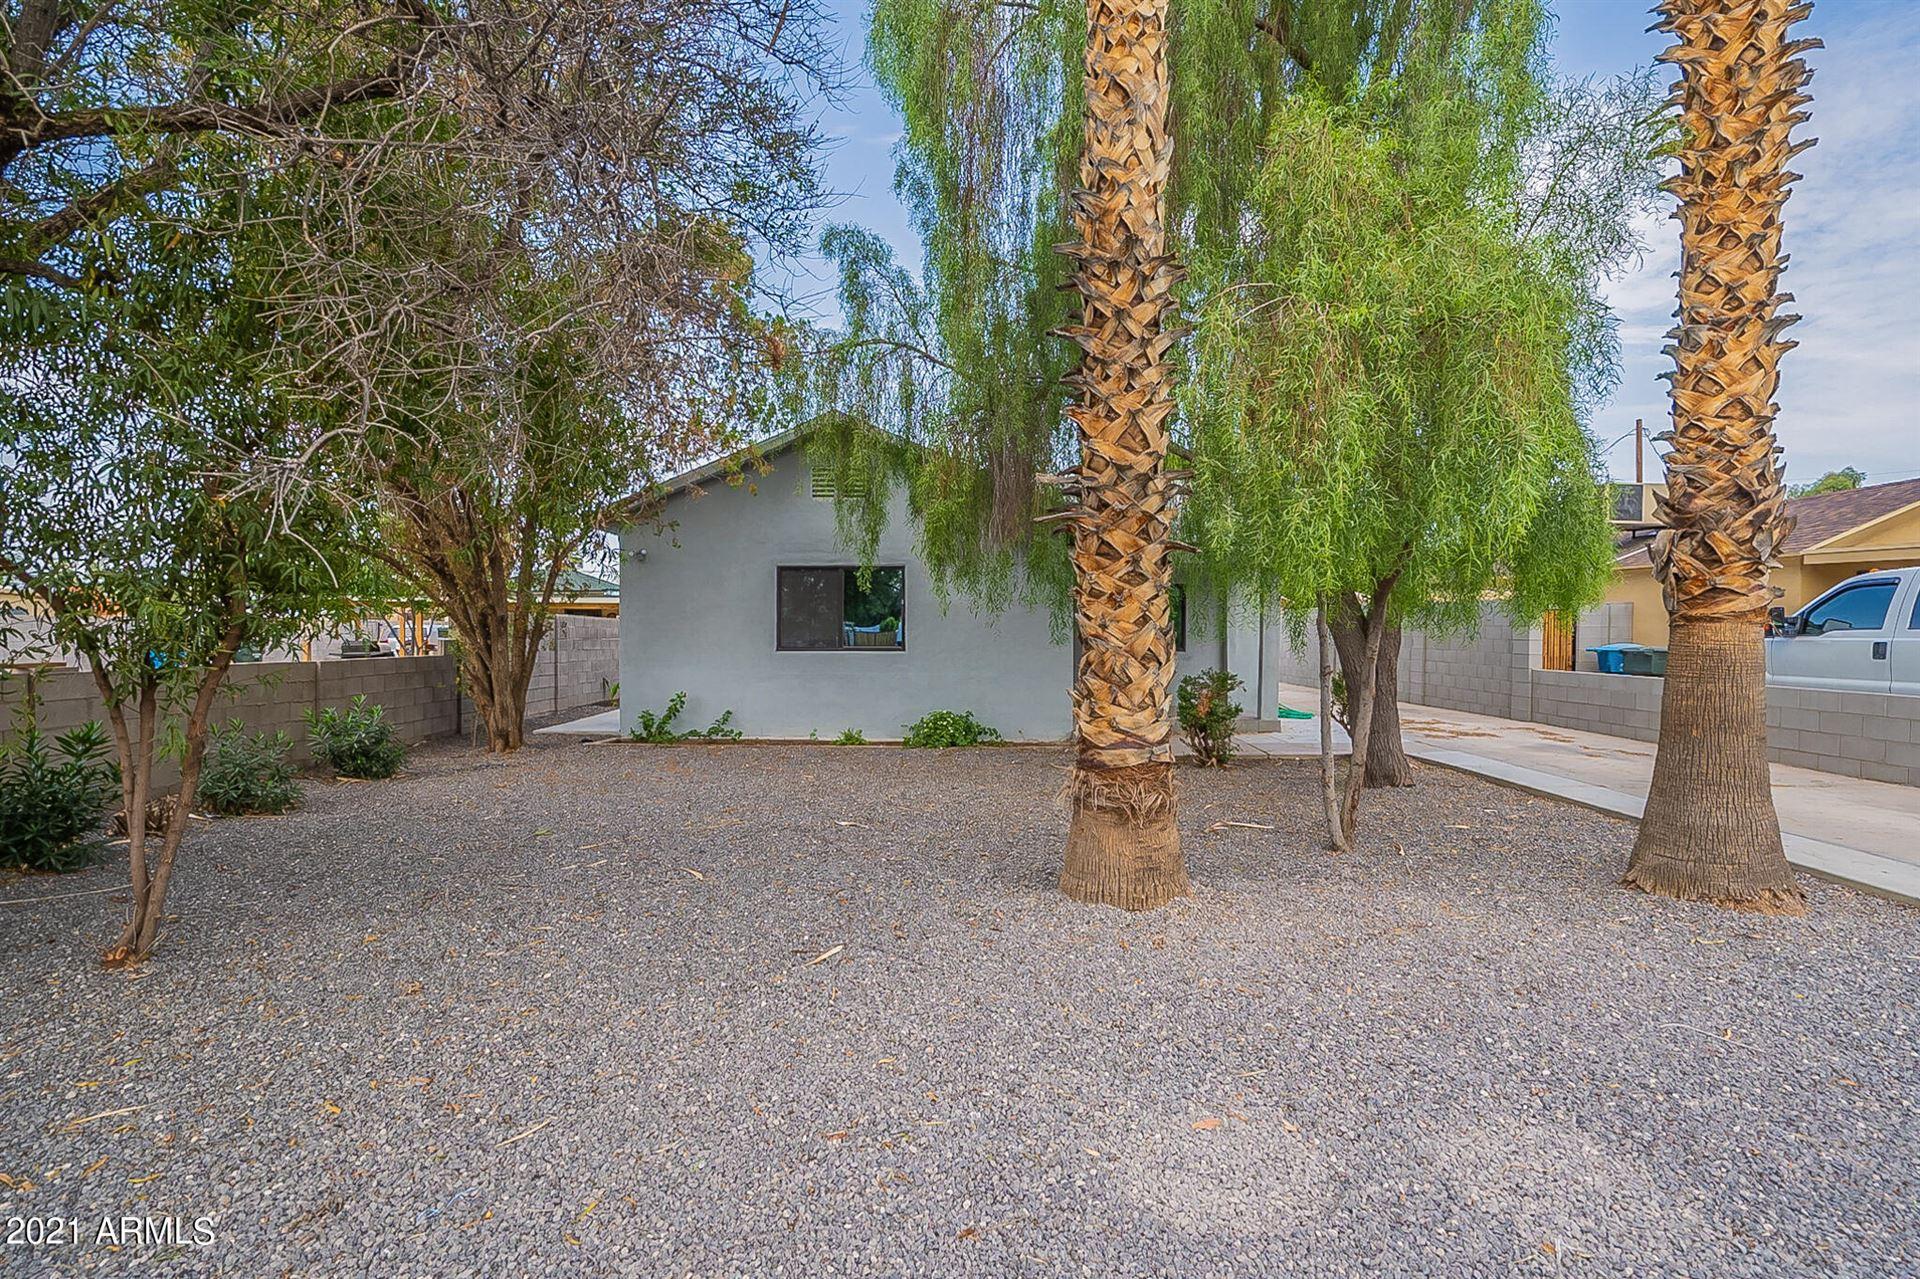 2520 N 29TH Street N, Phoenix, AZ 85008 - MLS#: 6261226